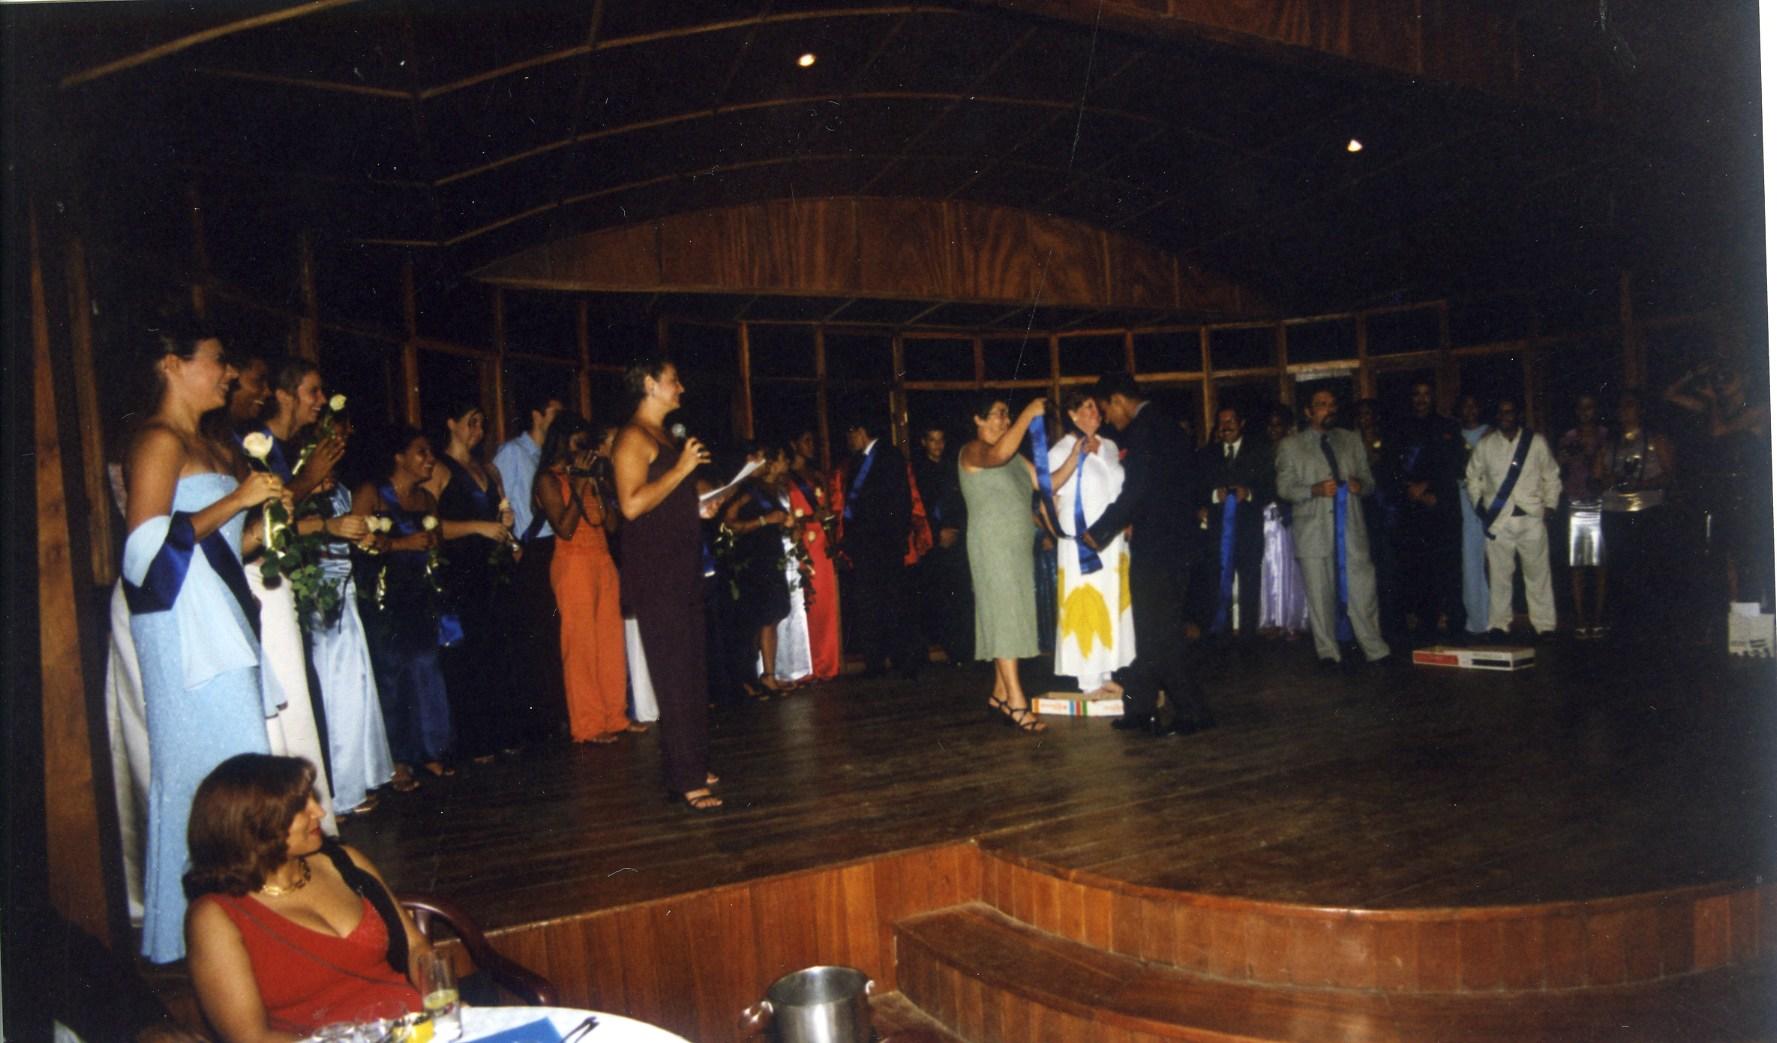 baile finalistas S 2000-2001